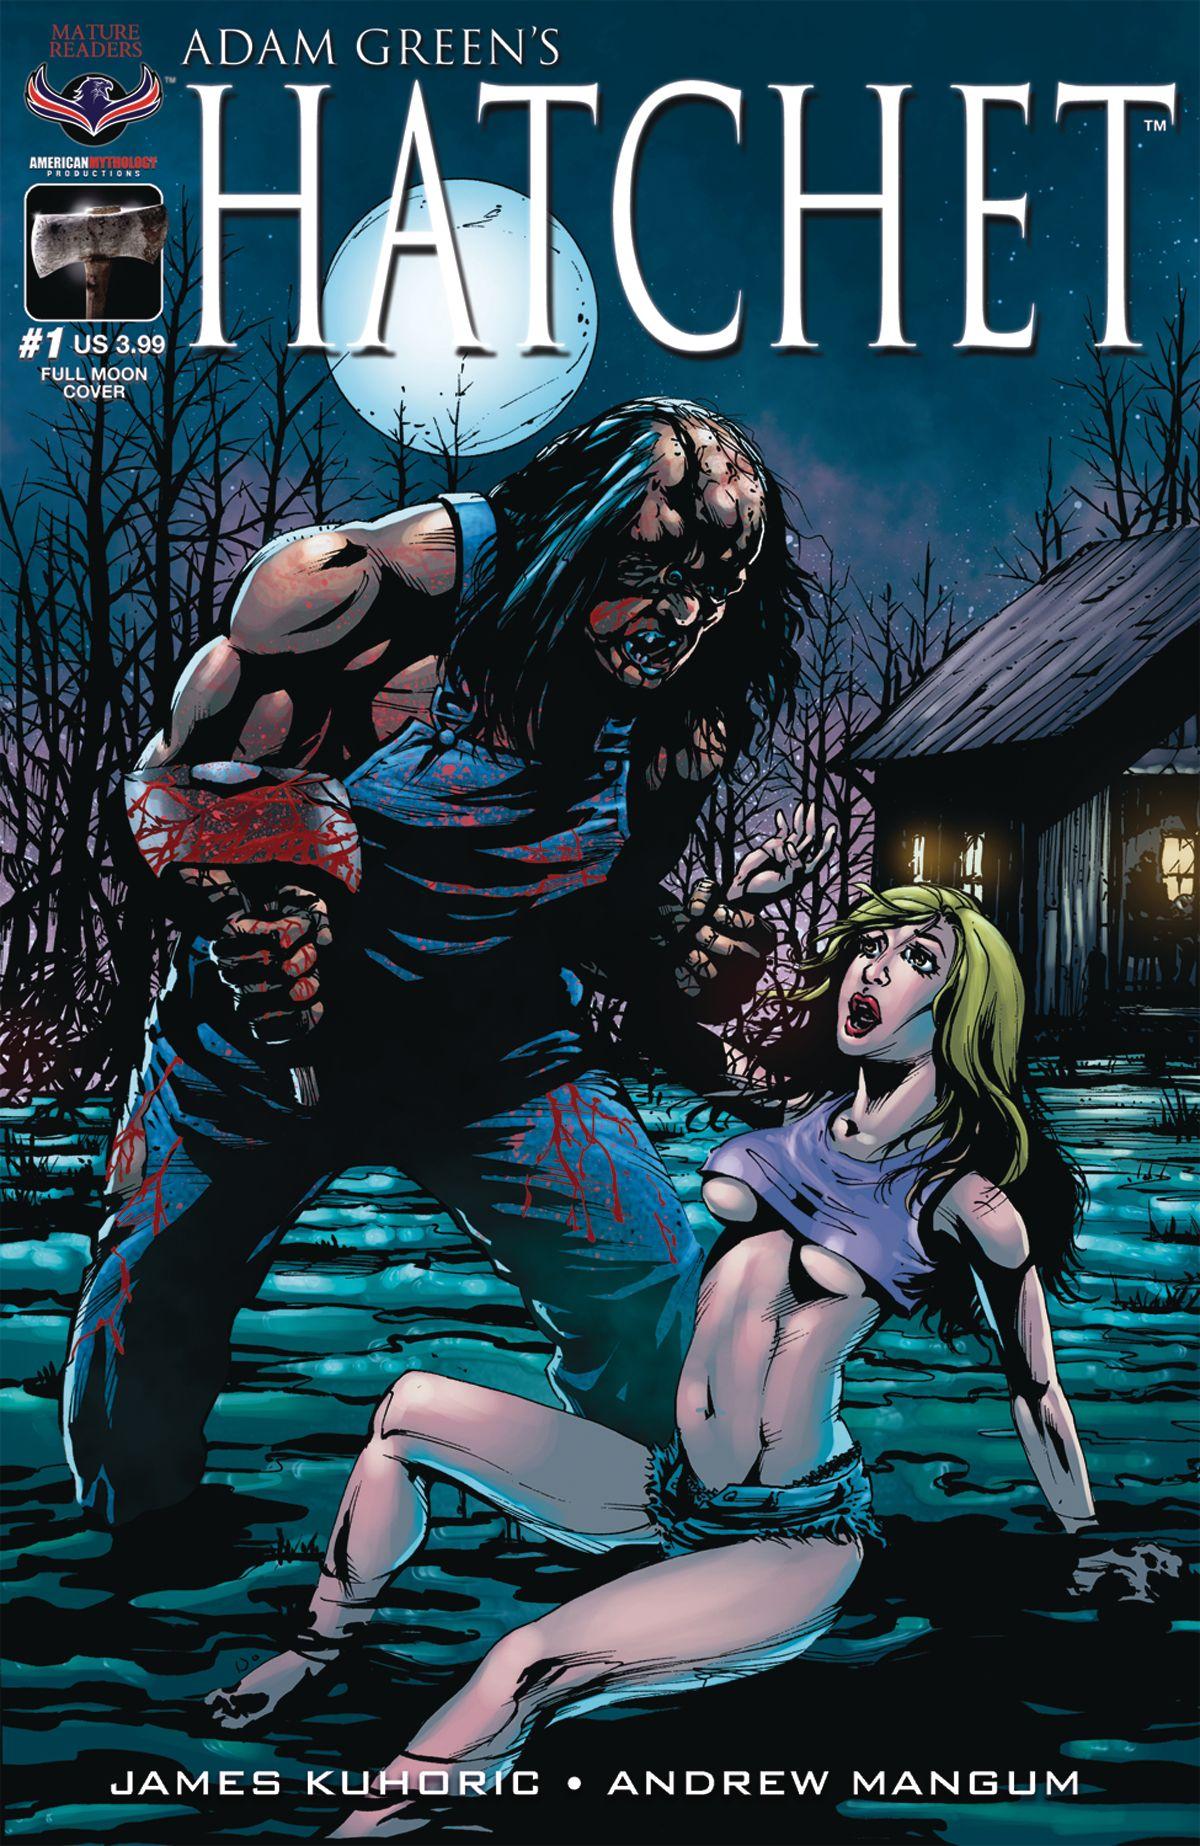 American Erotic Comics hatchet #1 larocque full moon cvr | mythology, american